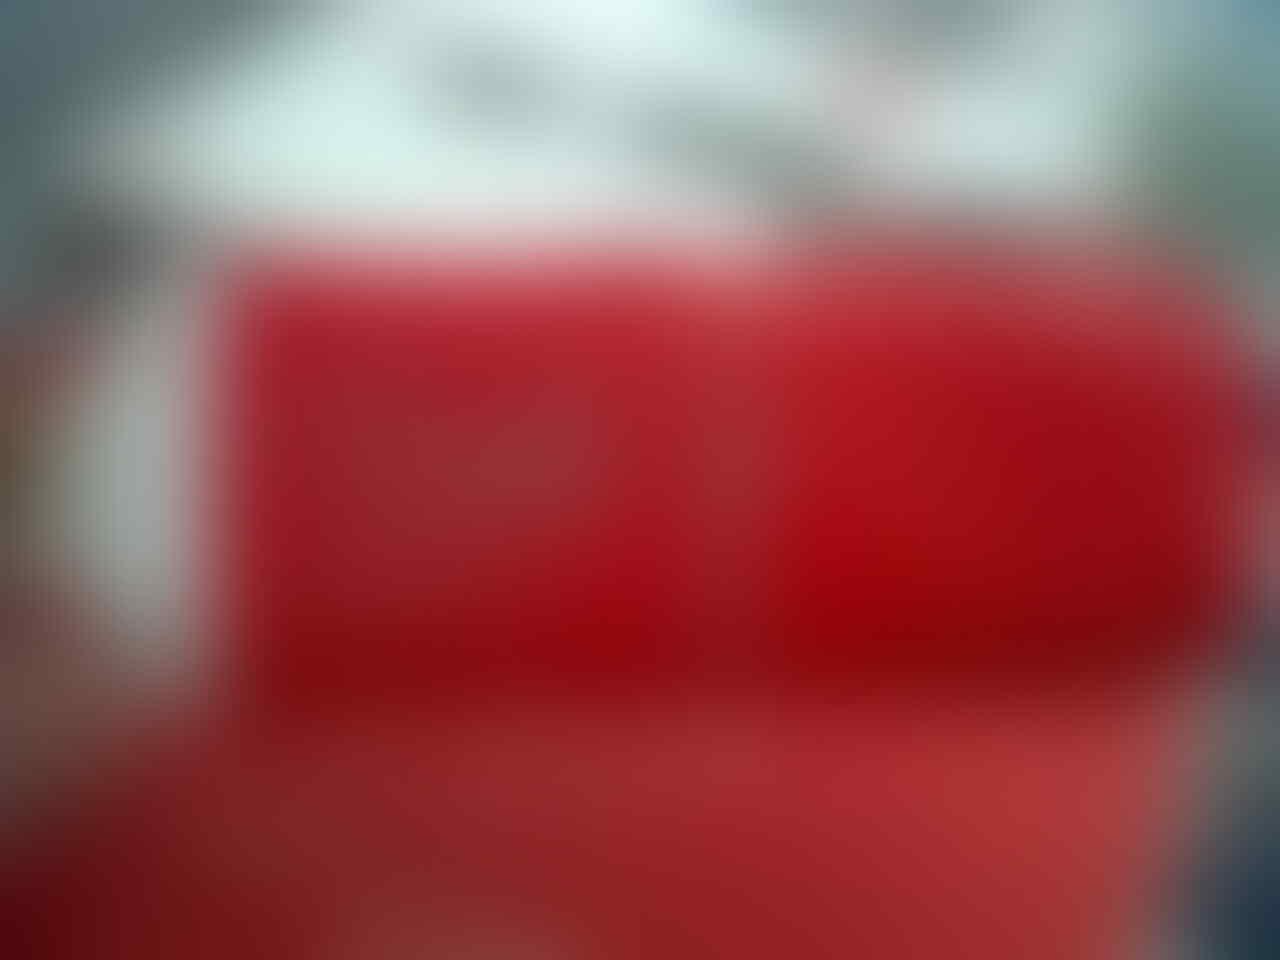 JUAL MODEM HUAWEI K4510 28,8 MBPS MURAH JOGJA